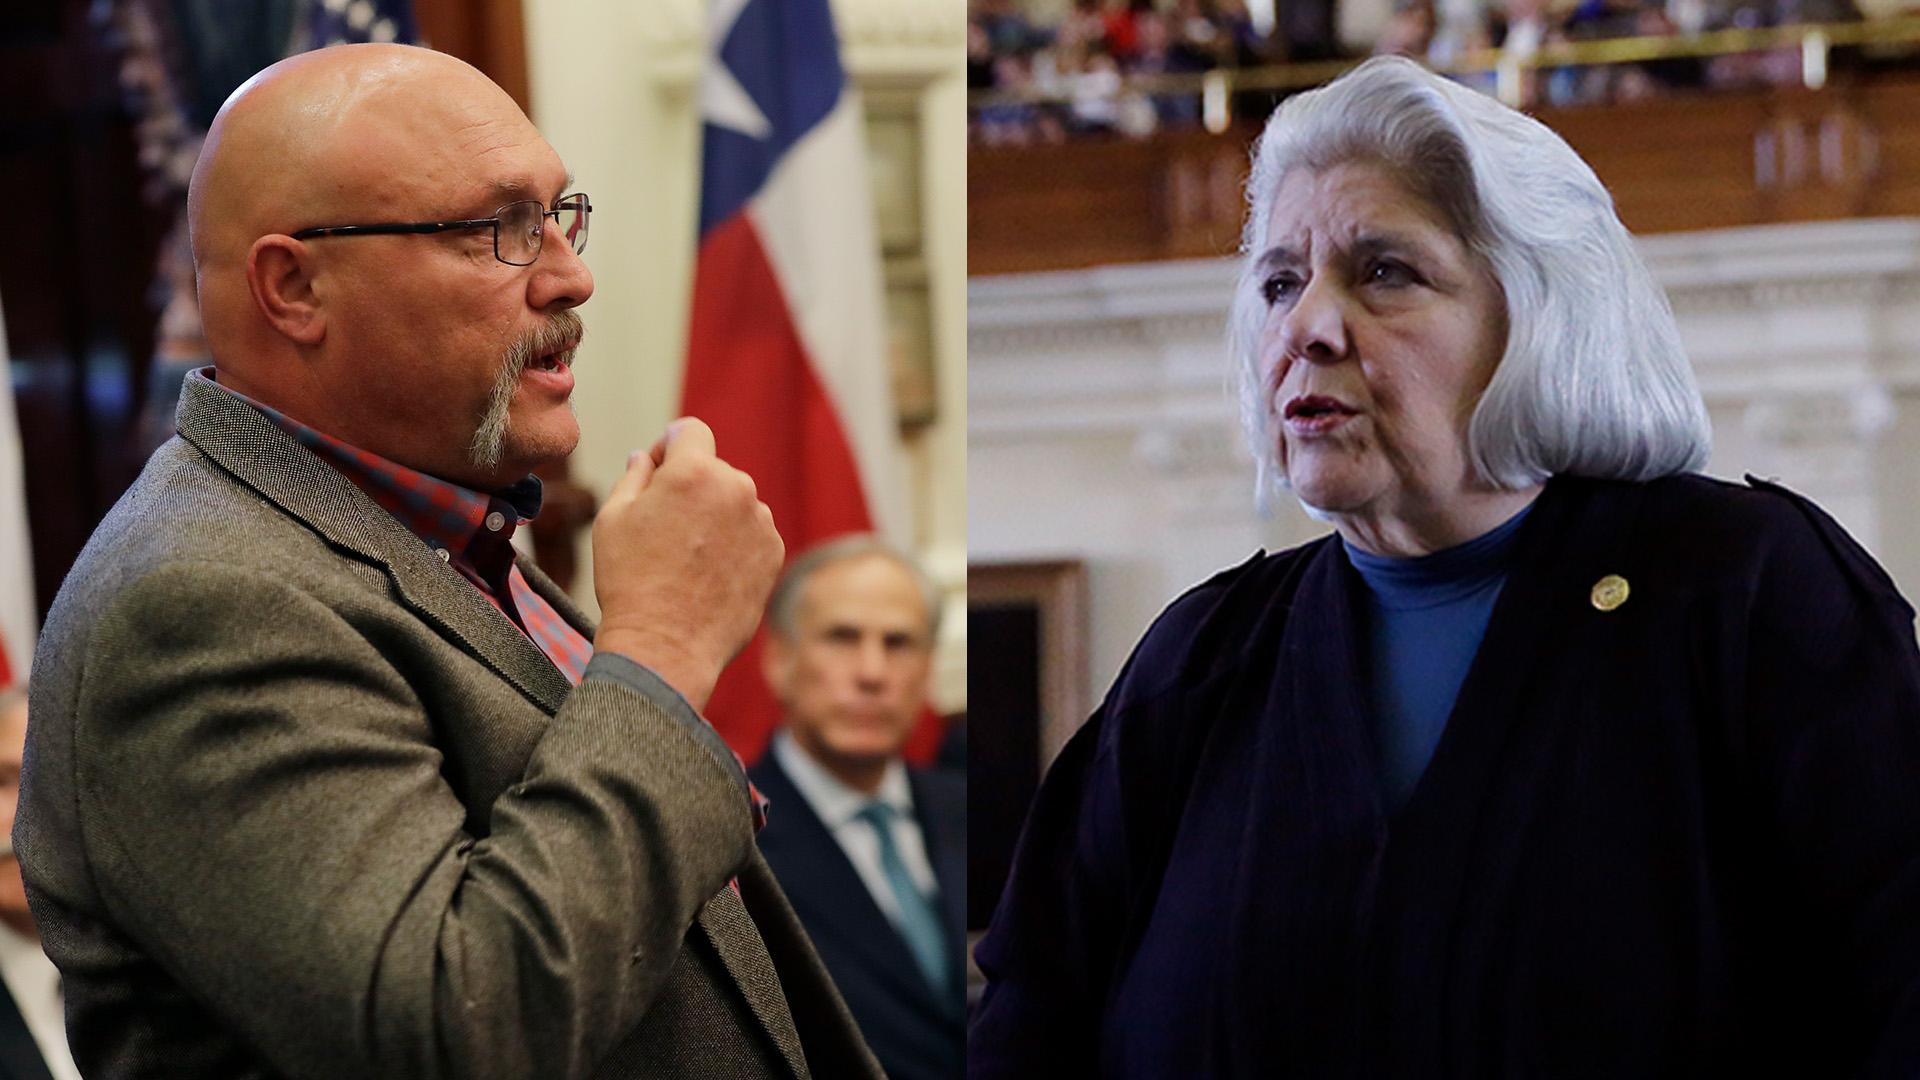 Frank Pomeroy and Judith Zaffirini (AP Photos)